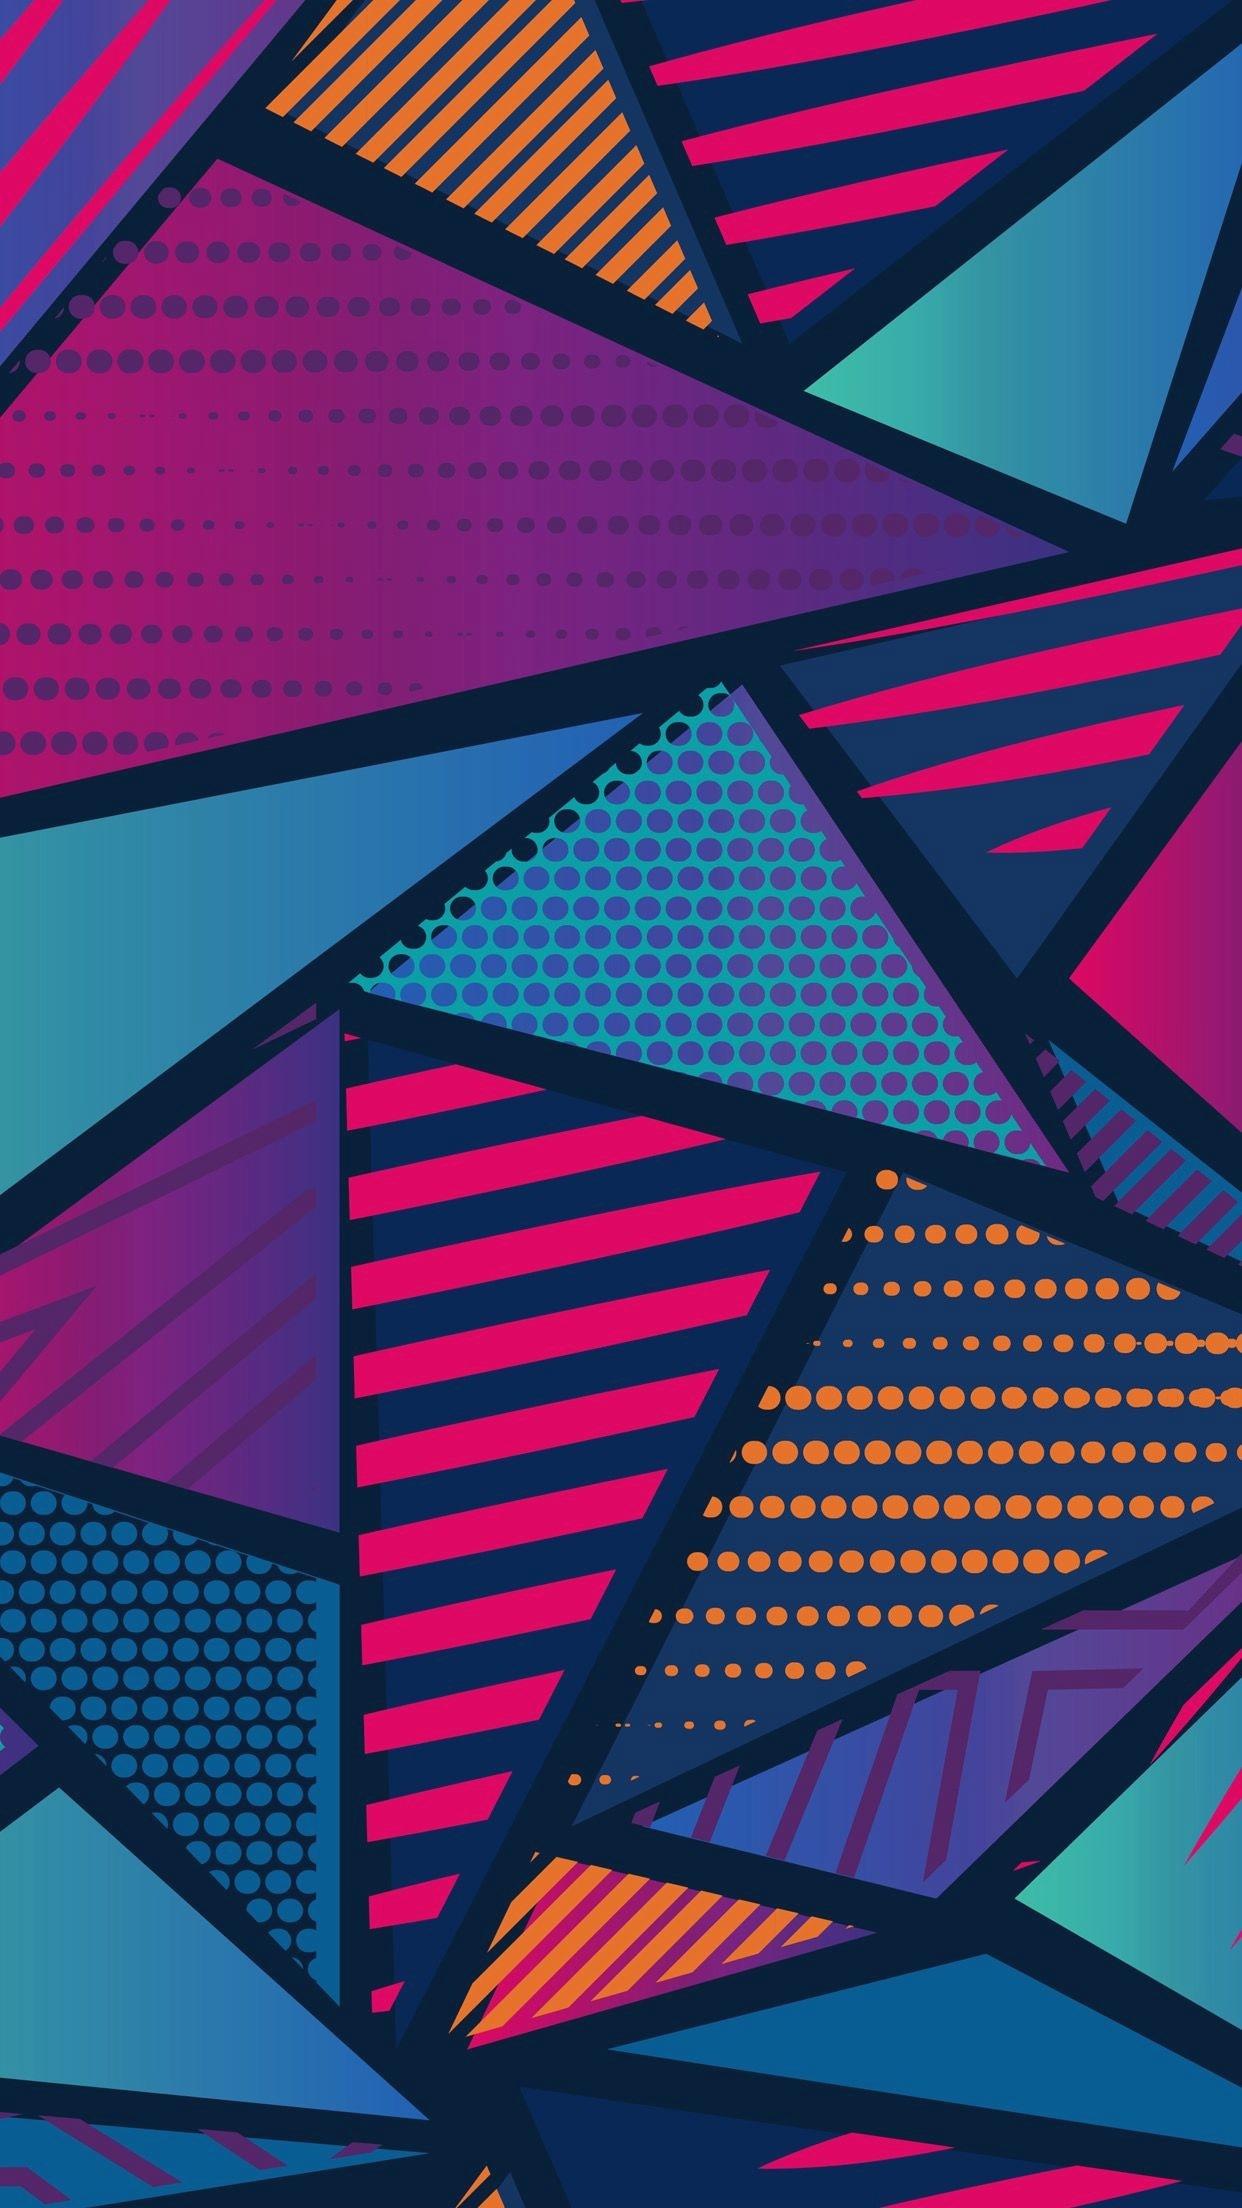 Cellphone Background Wallpaper Art Wallpaper Hd Portrait 28409 Hd Wallpaper Backgrounds Download